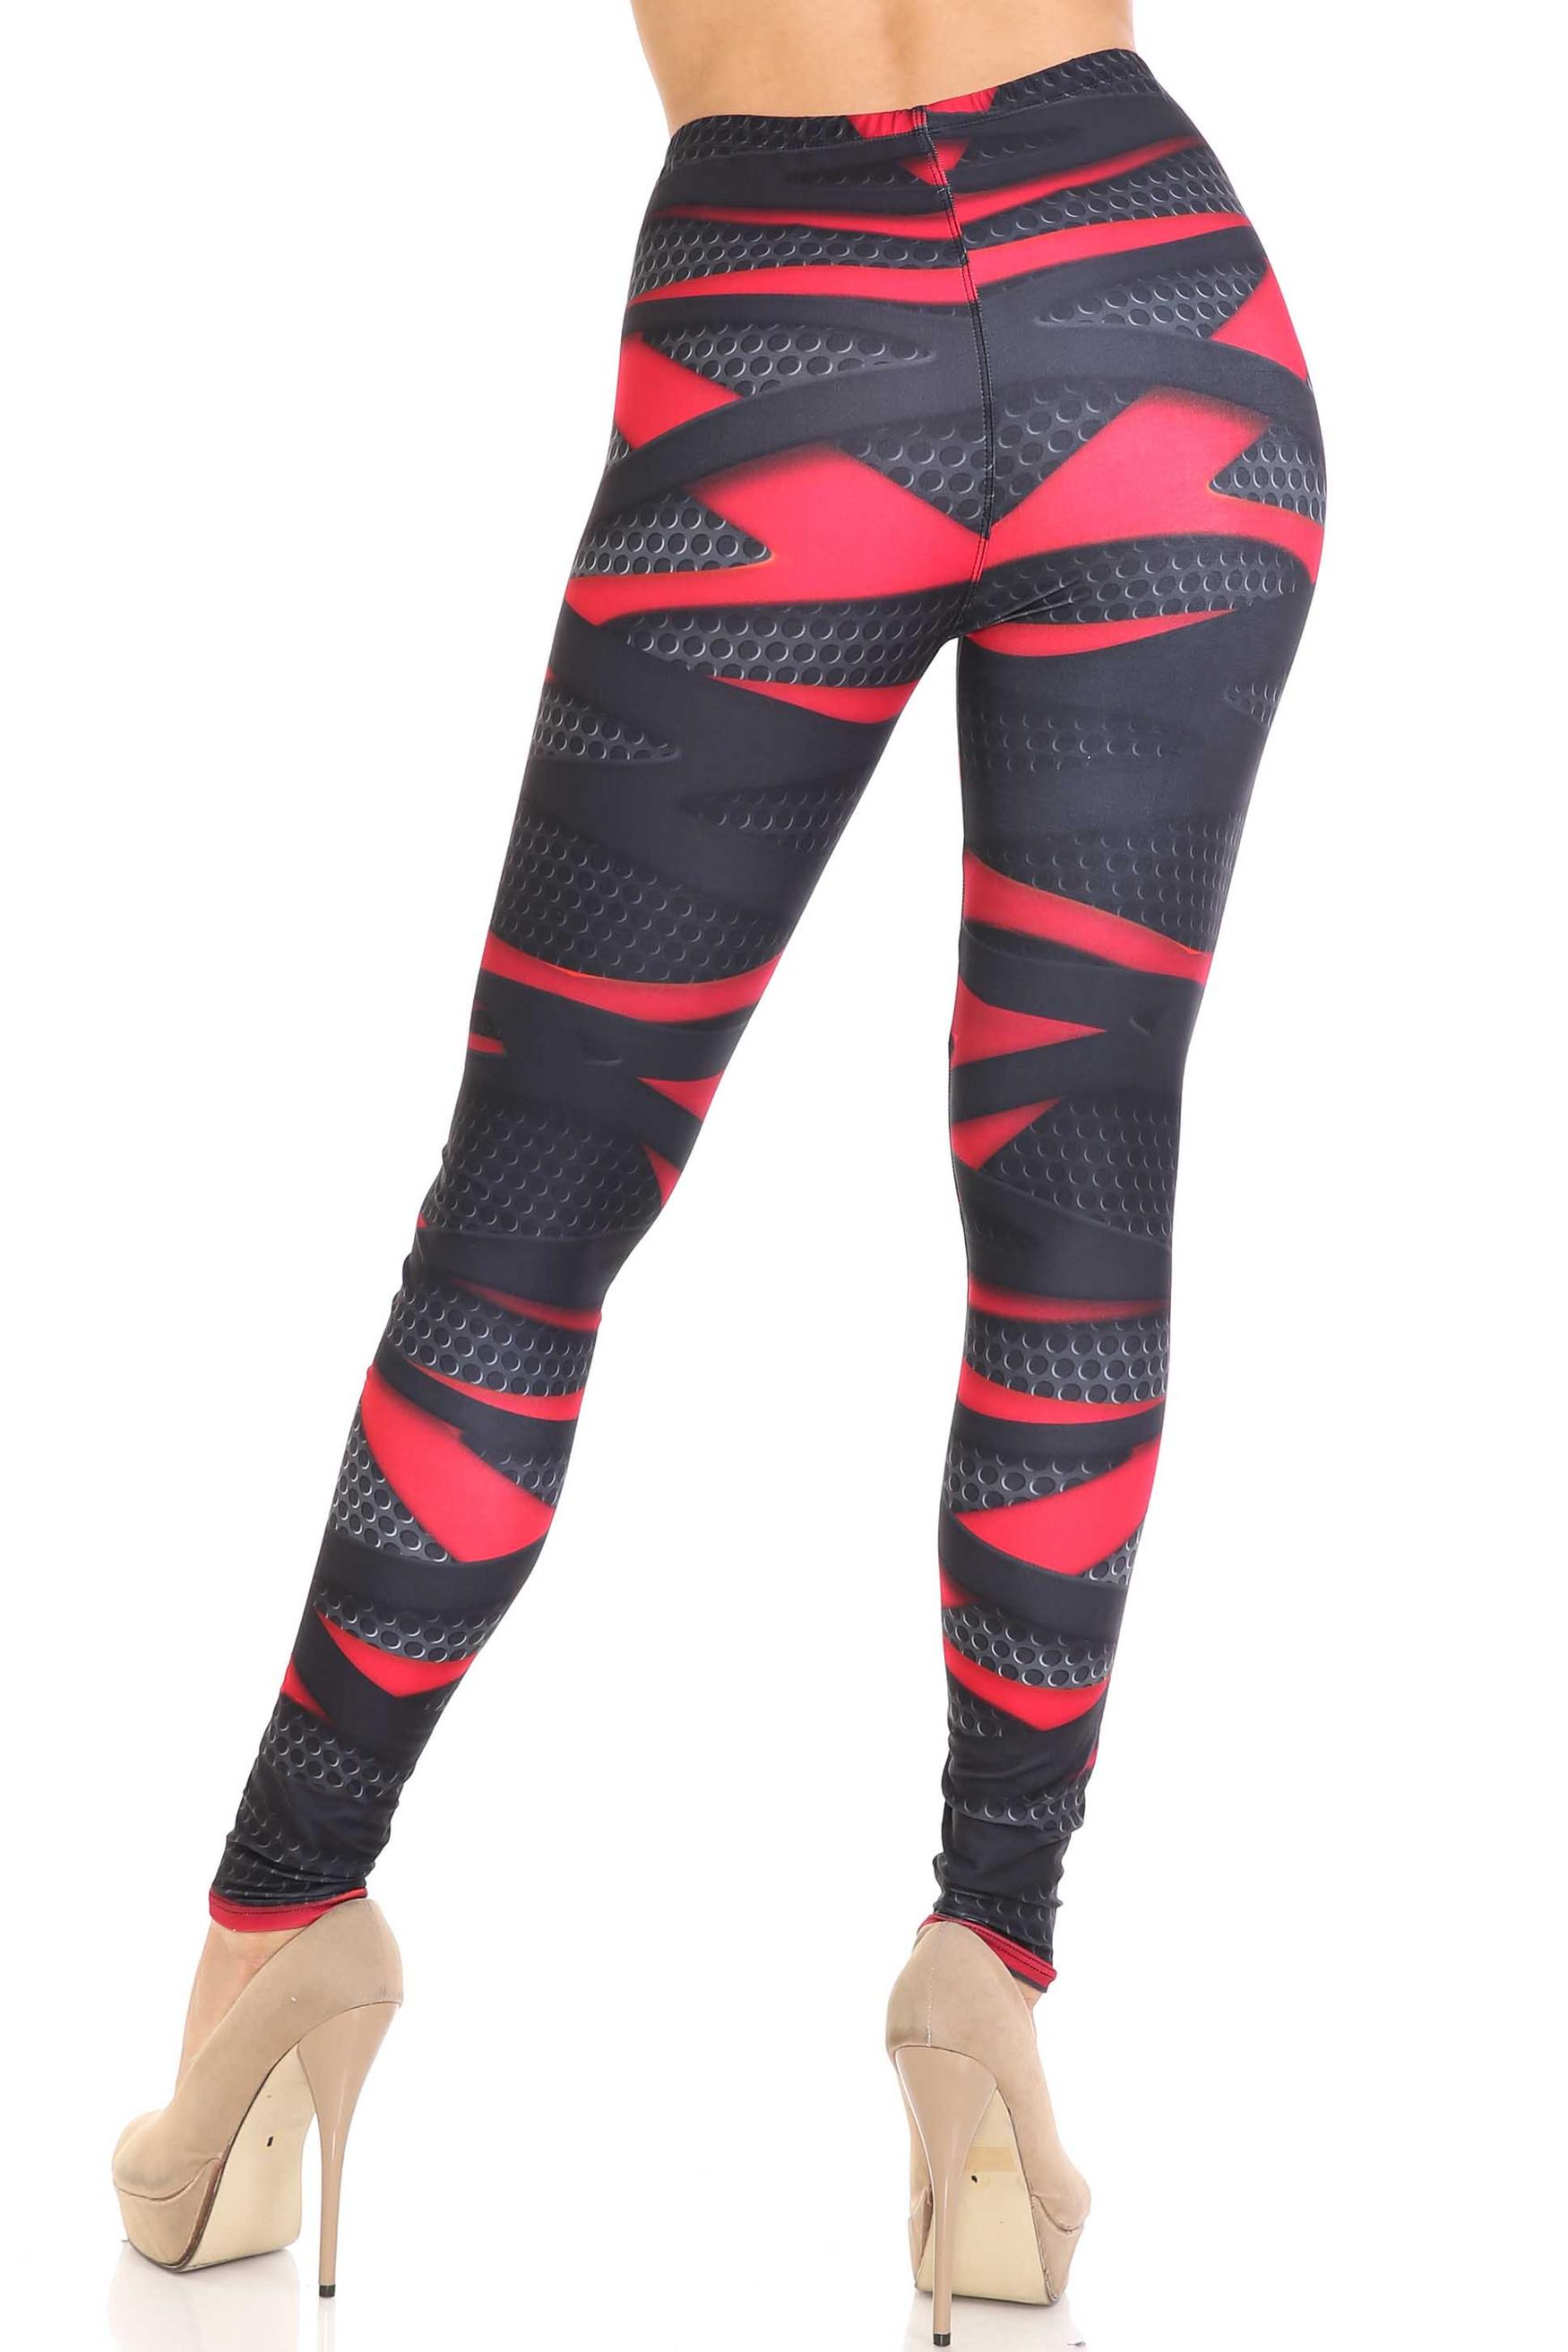 Creamy Soft Cascading 3D Sport Wrap Plus Size Leggings - USA Fashion™